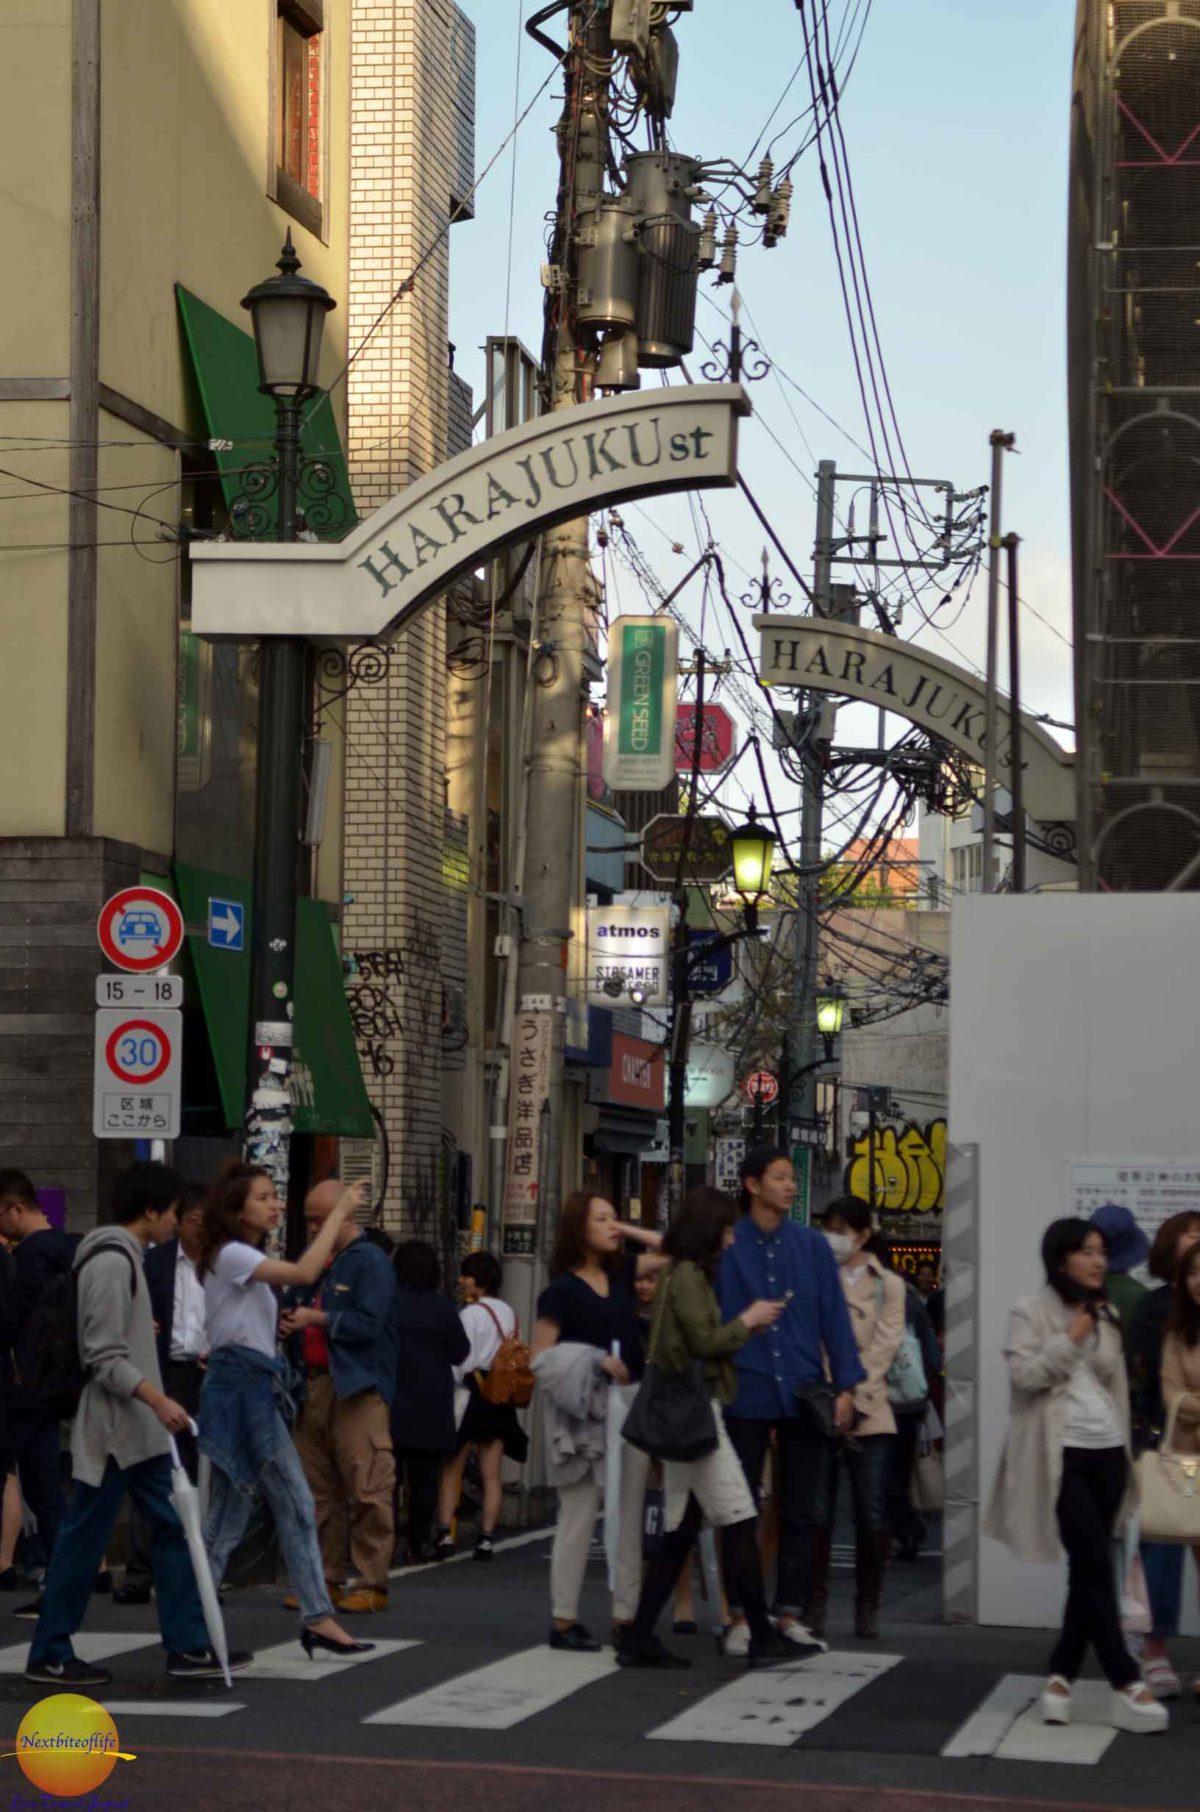 harajuku street in Shibuya 109 district